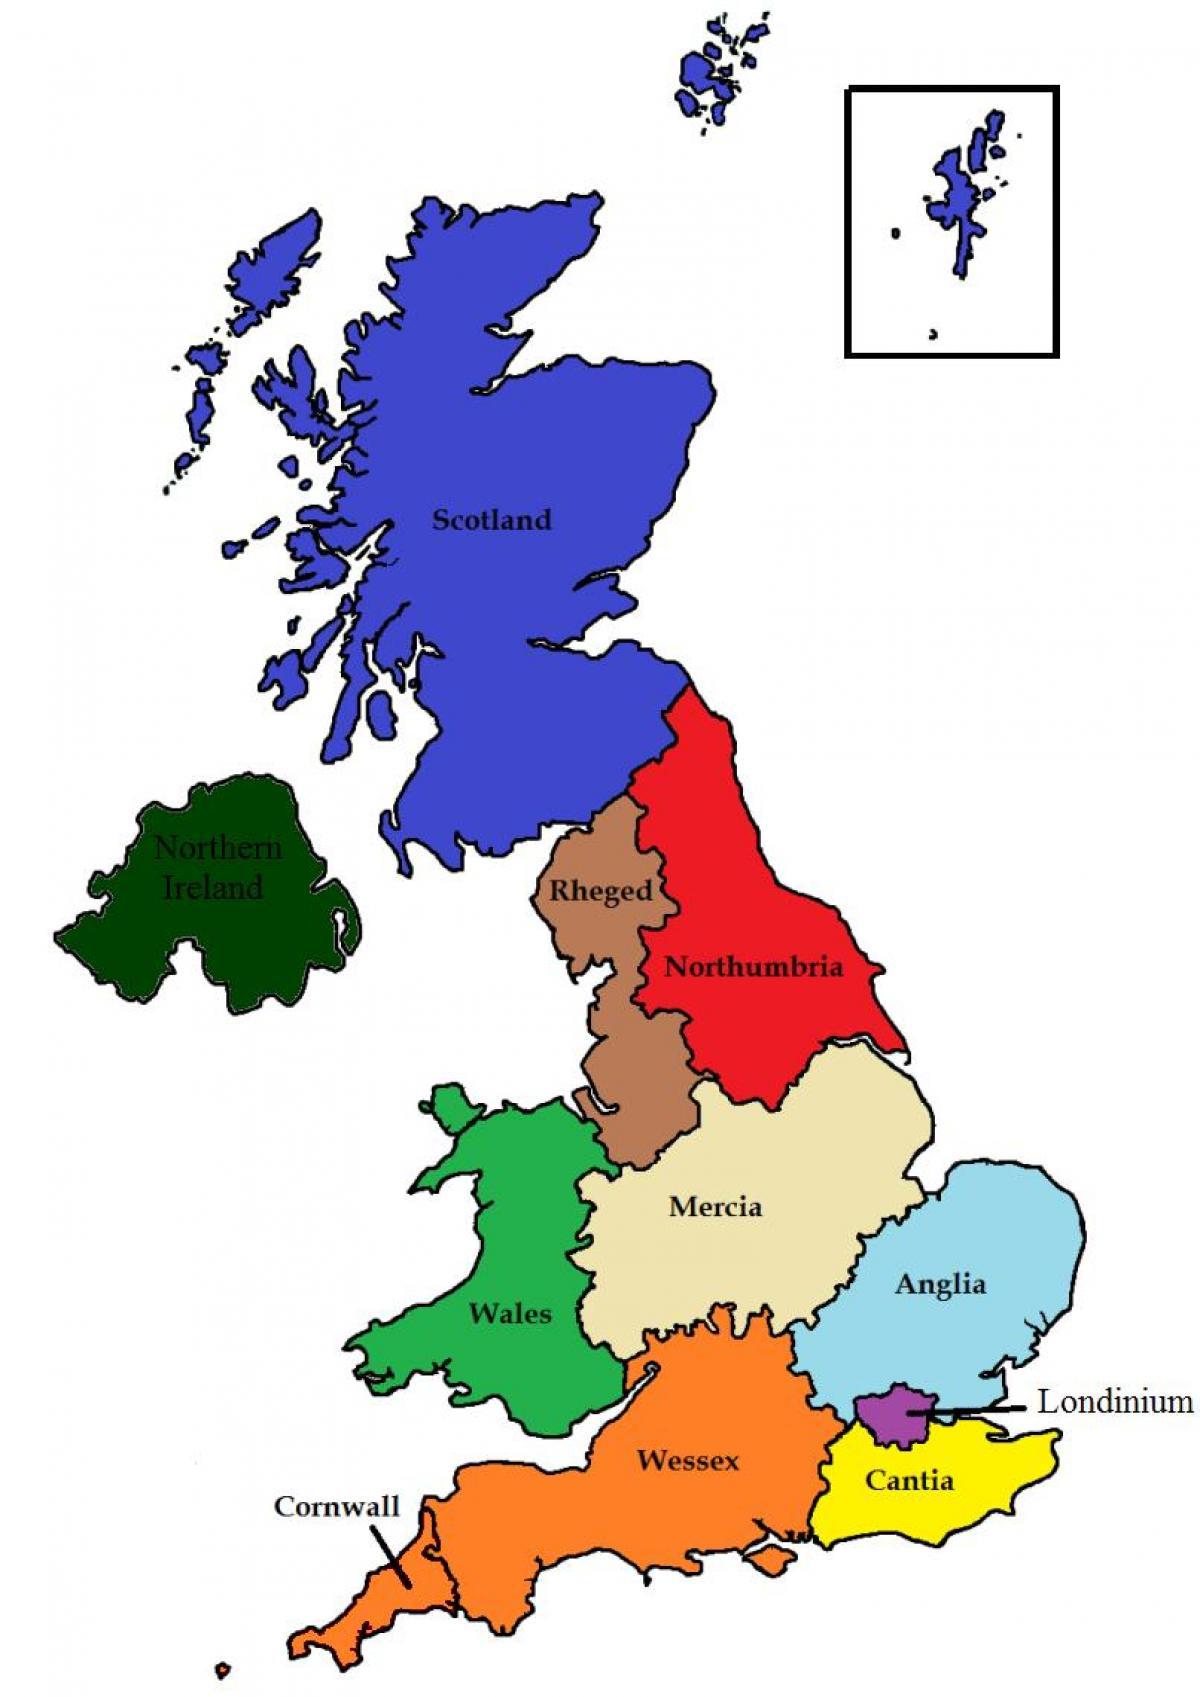 Map Of England Provinces.Uk Provinces Map Map Of Uk Provinces Northern Europe Europe